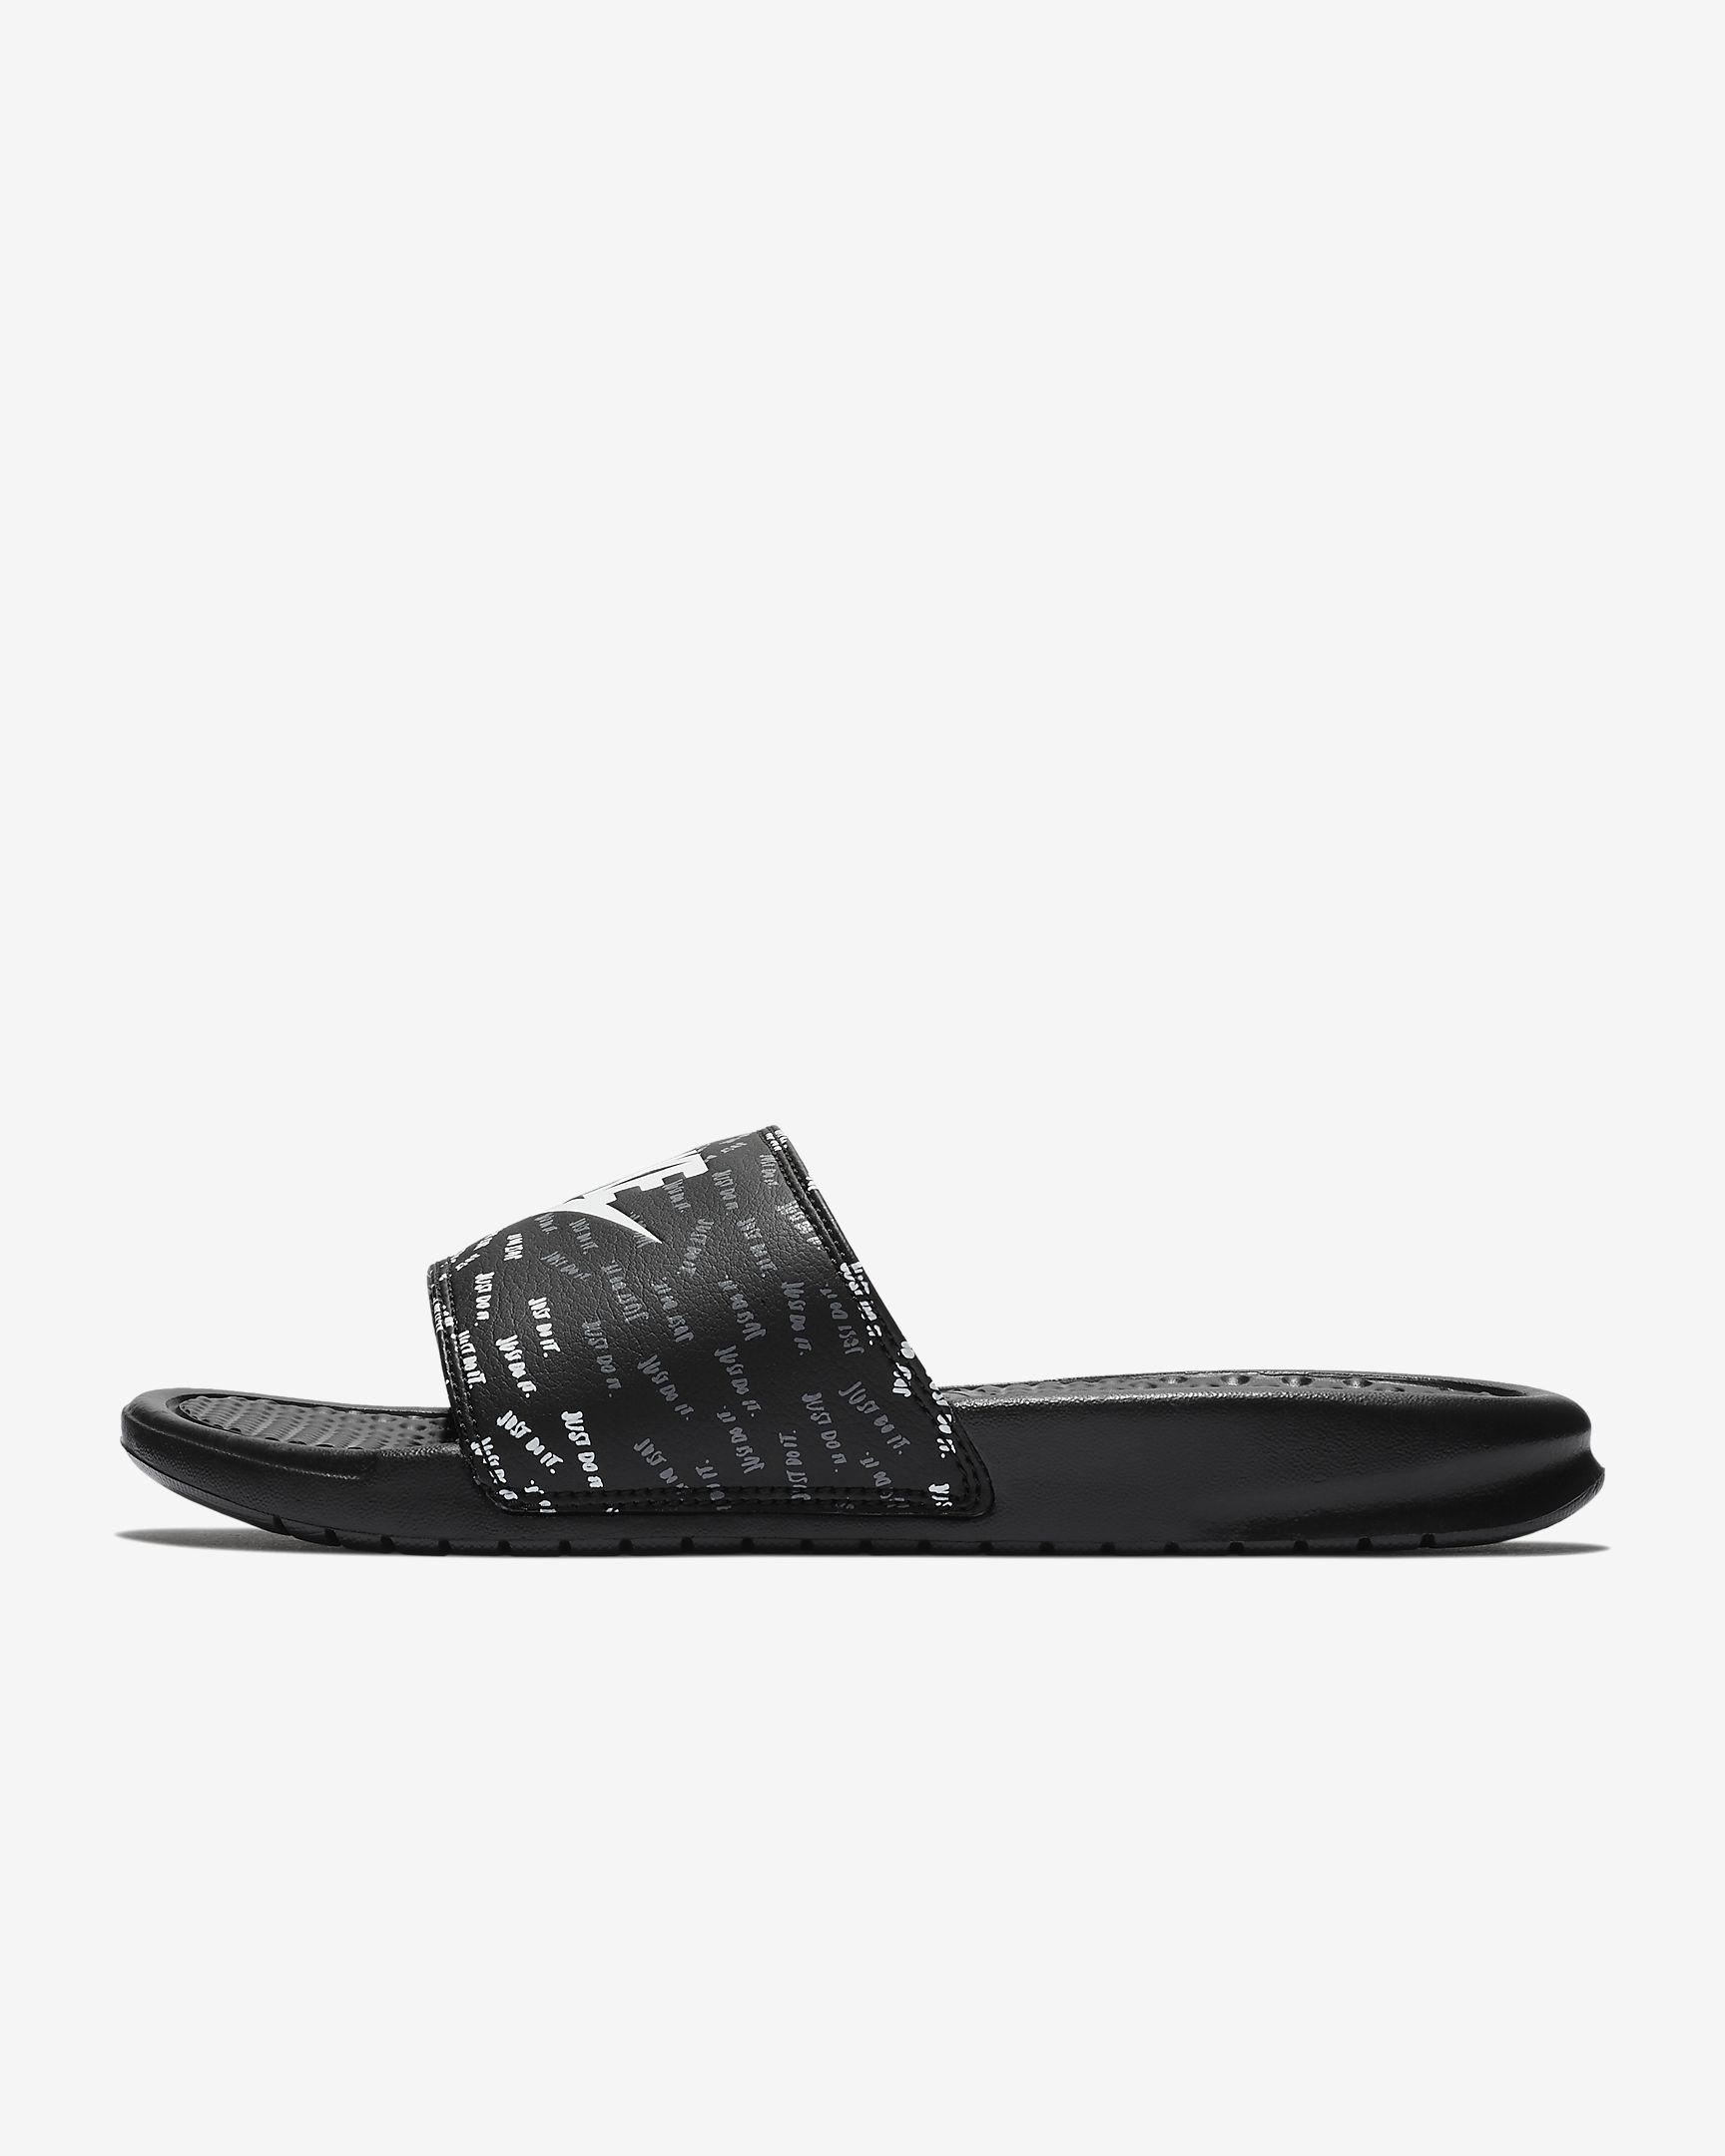 7561e245f7e8 Nike Benassi JDI Print Women s Slide